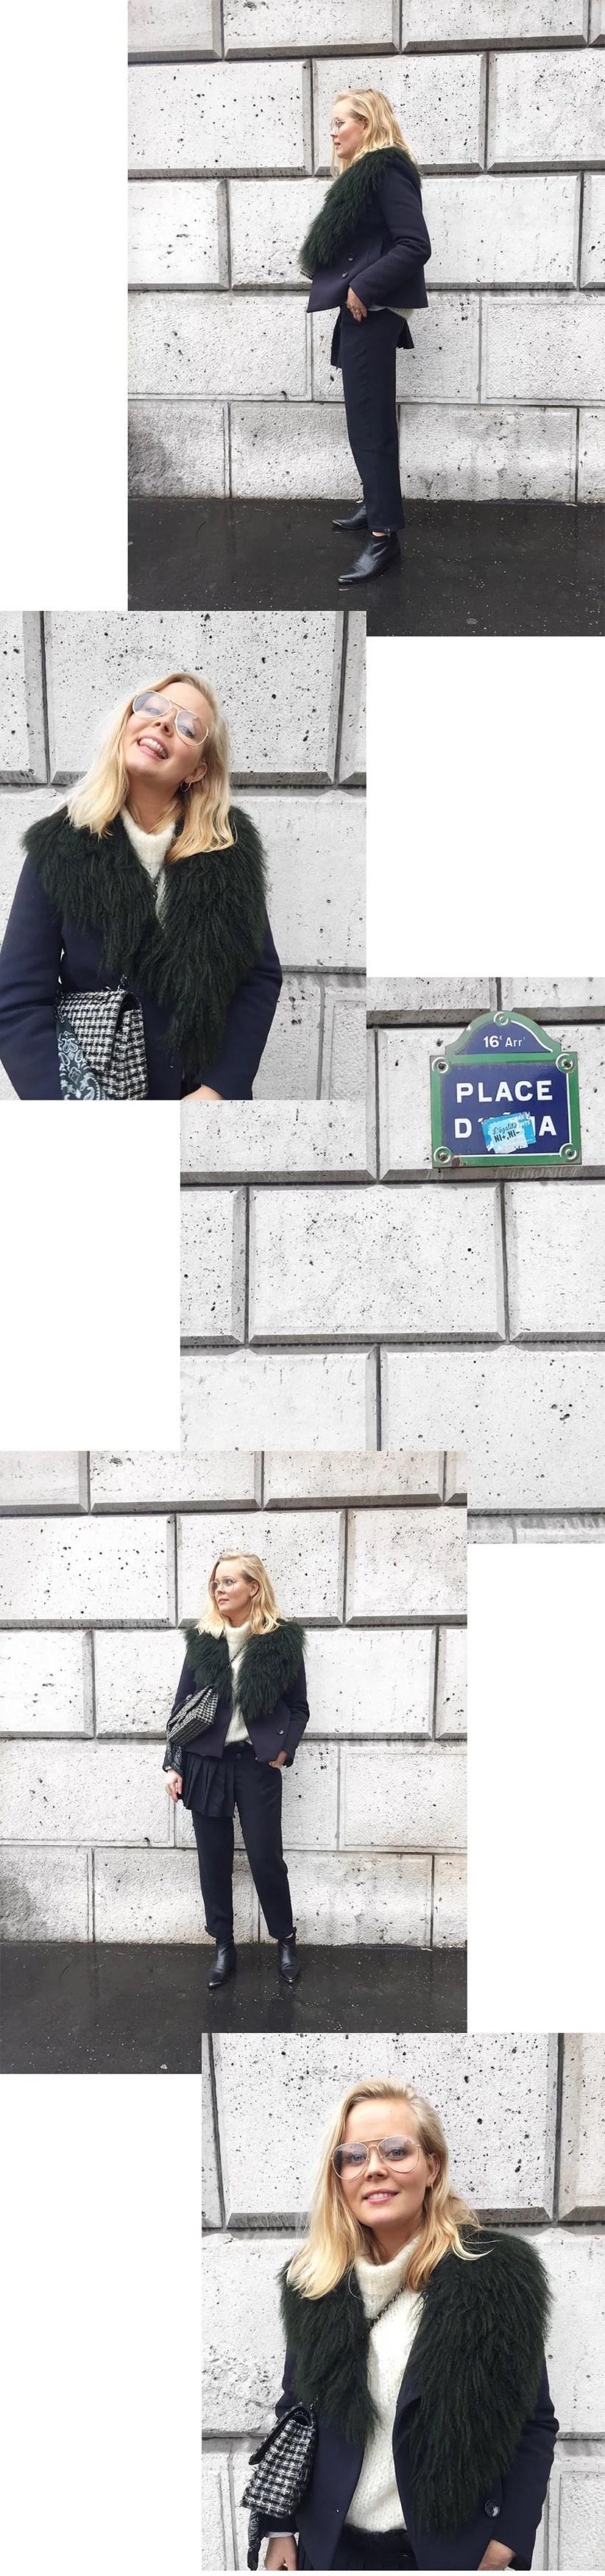 Paris on my birthday